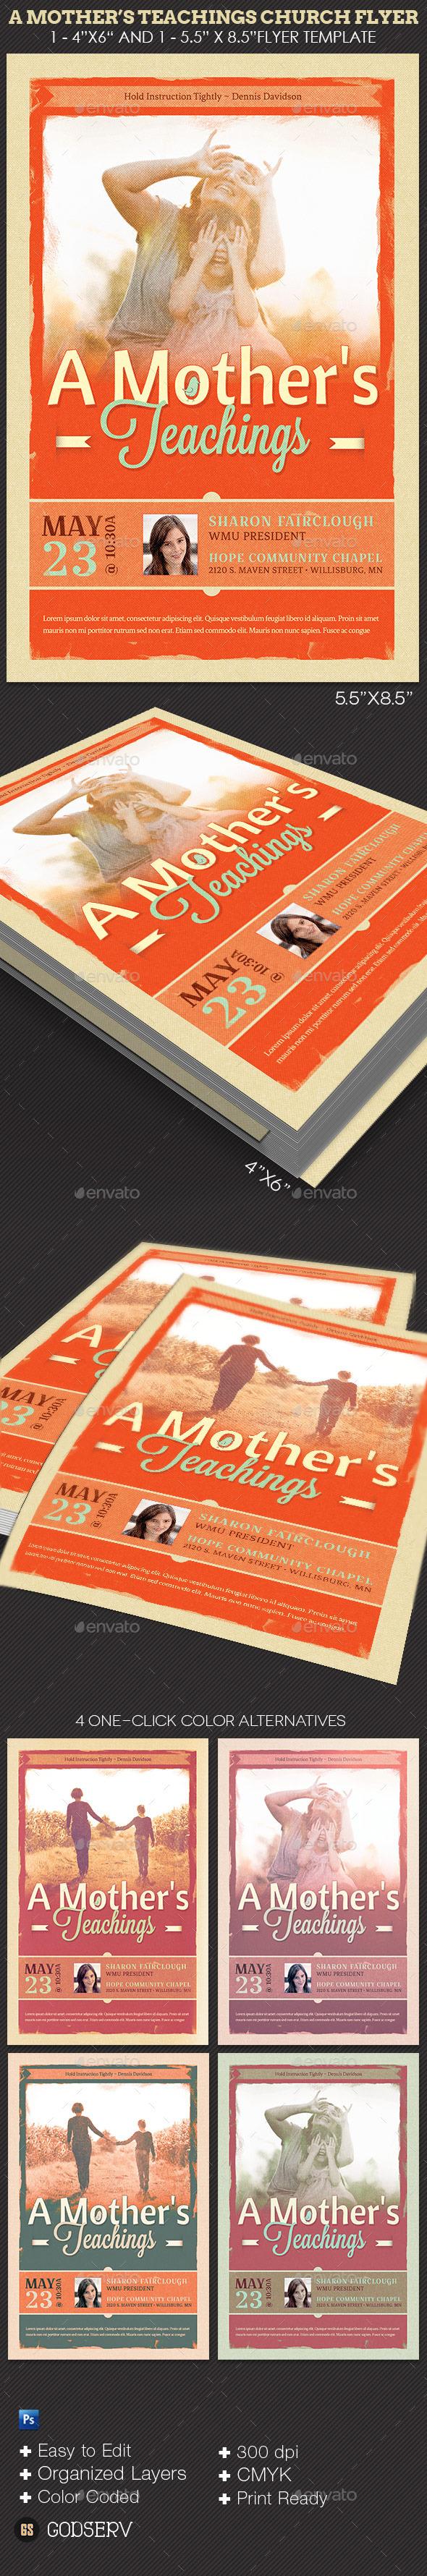 A Mother's Teachings Church Flyer Template - Church Flyers